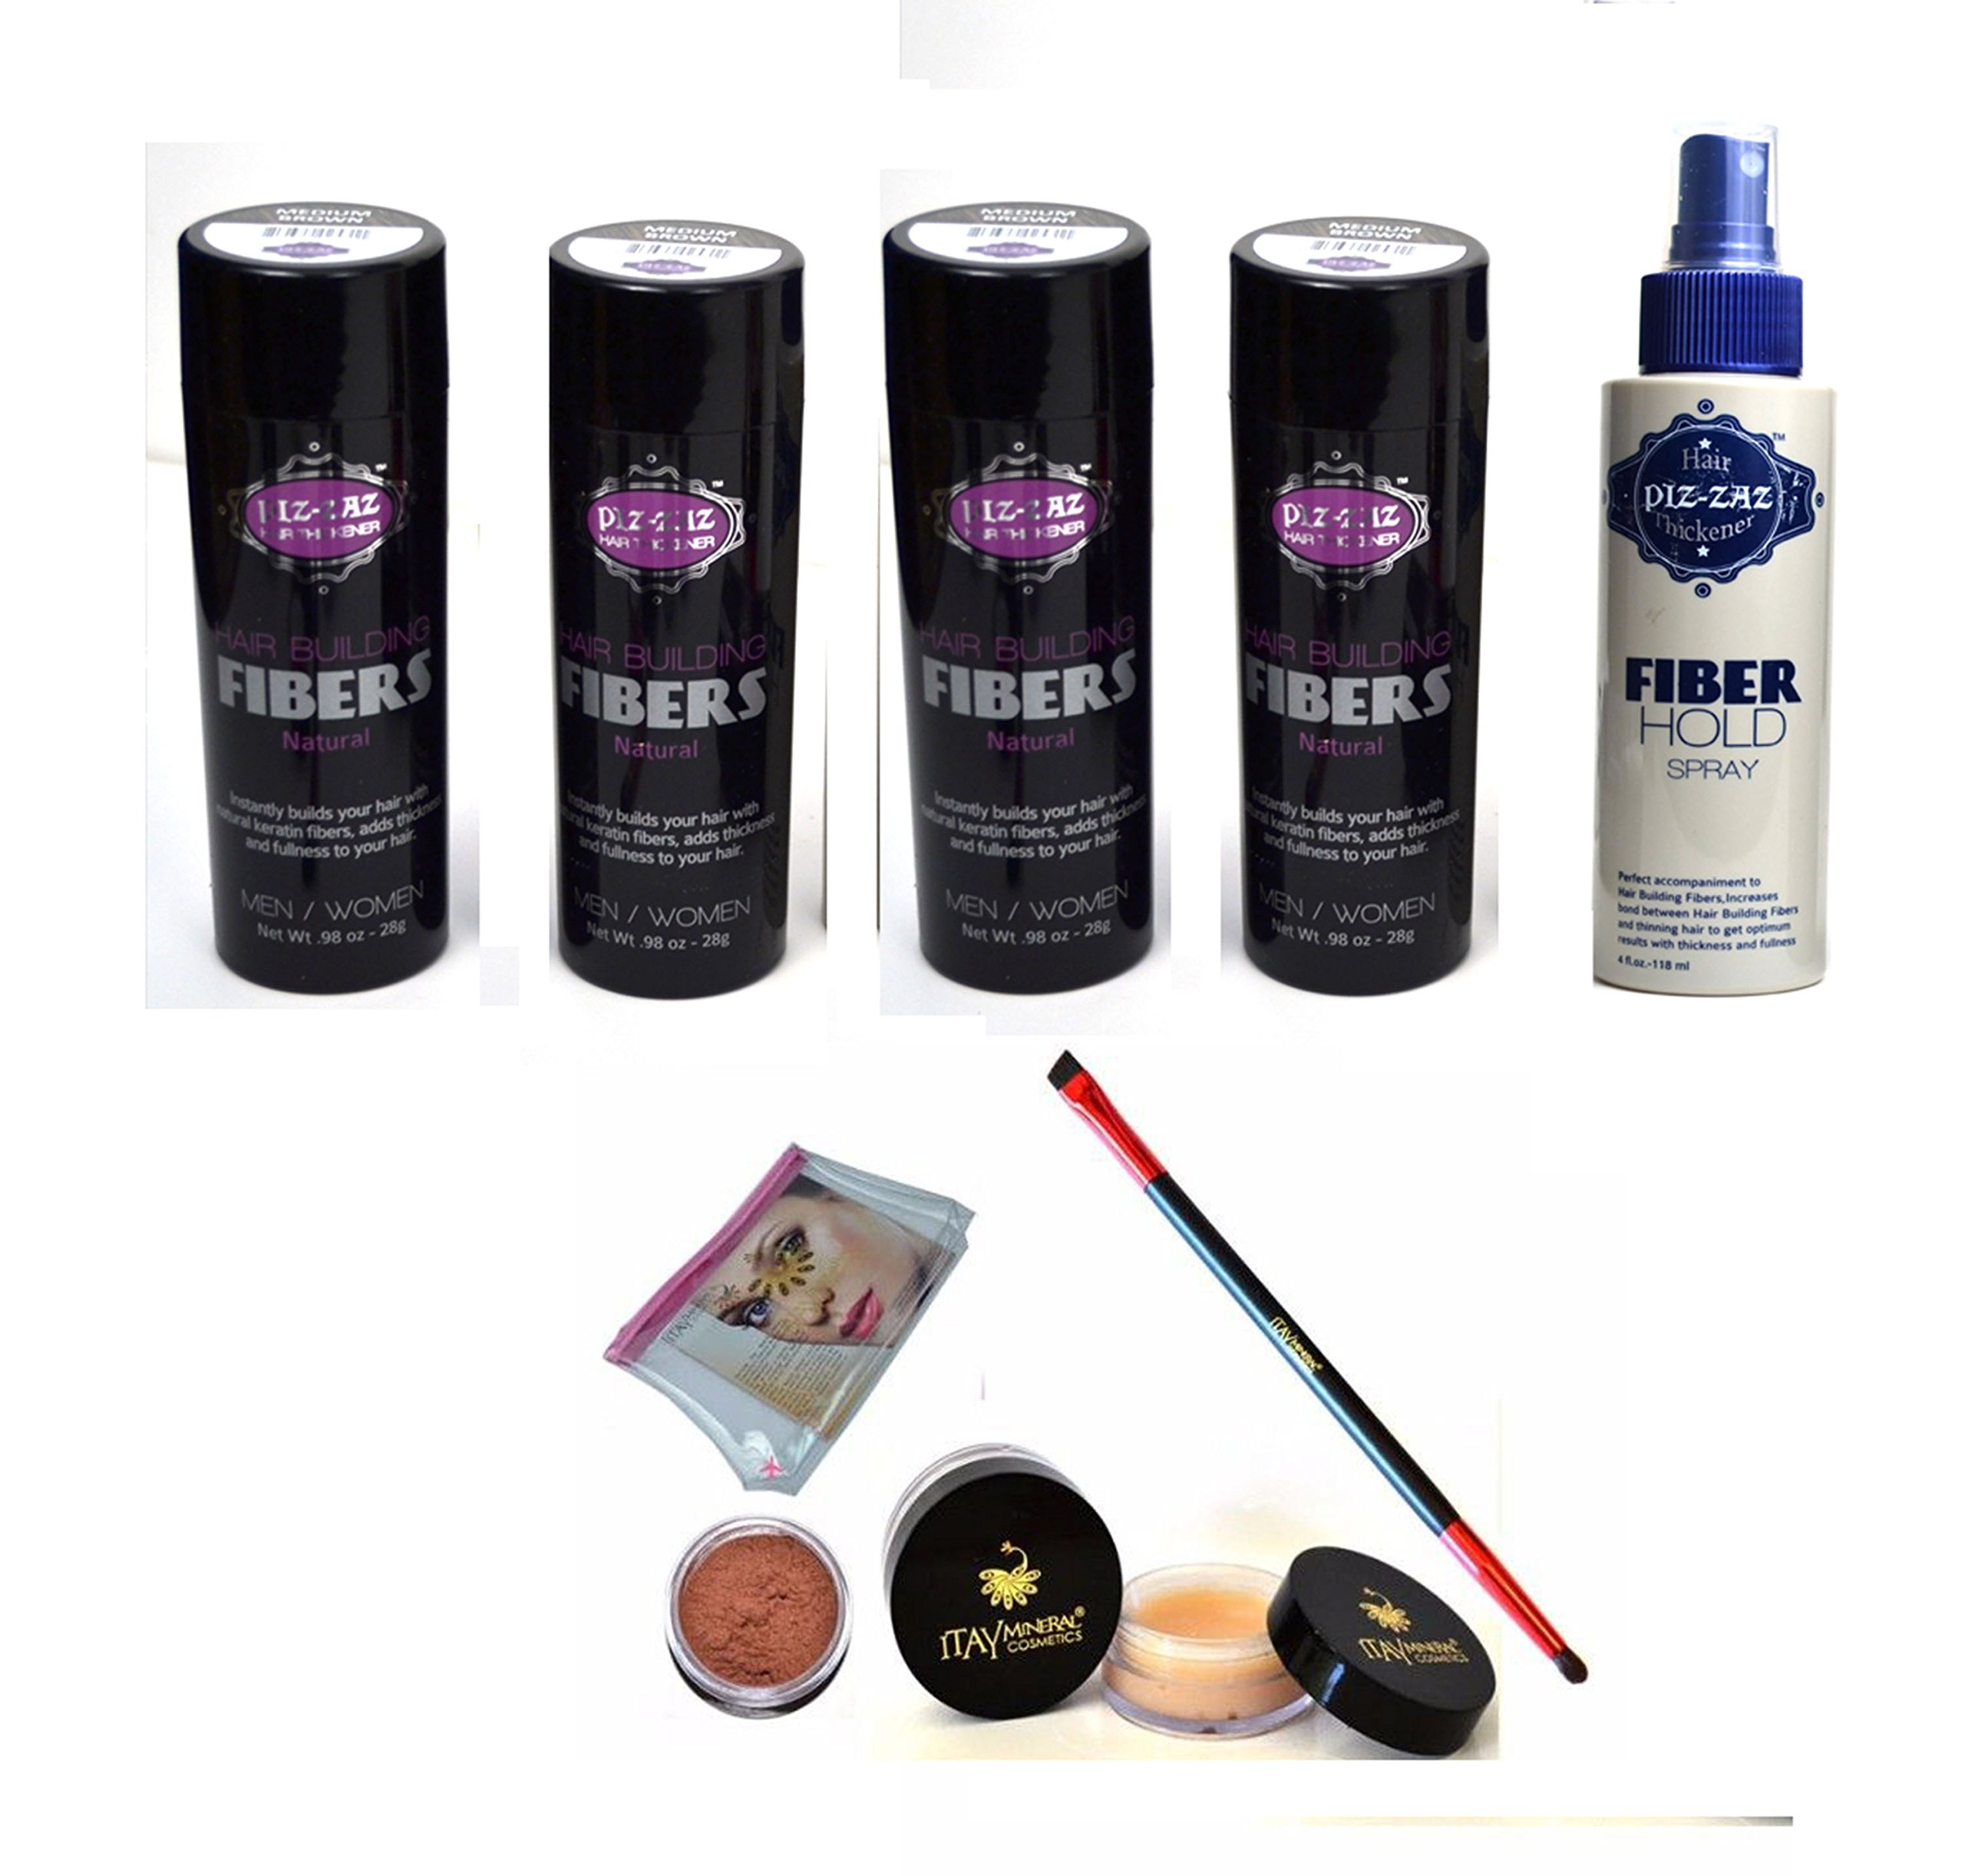 Bundle 6 Items: Piz-zaz Hair Fibers 4x Hair Fibers+ Hold Fiber Spray + Matching Itay Brow Building Fiber Set (PIZ-ZAZ HAIR FIBERS- BLACK)